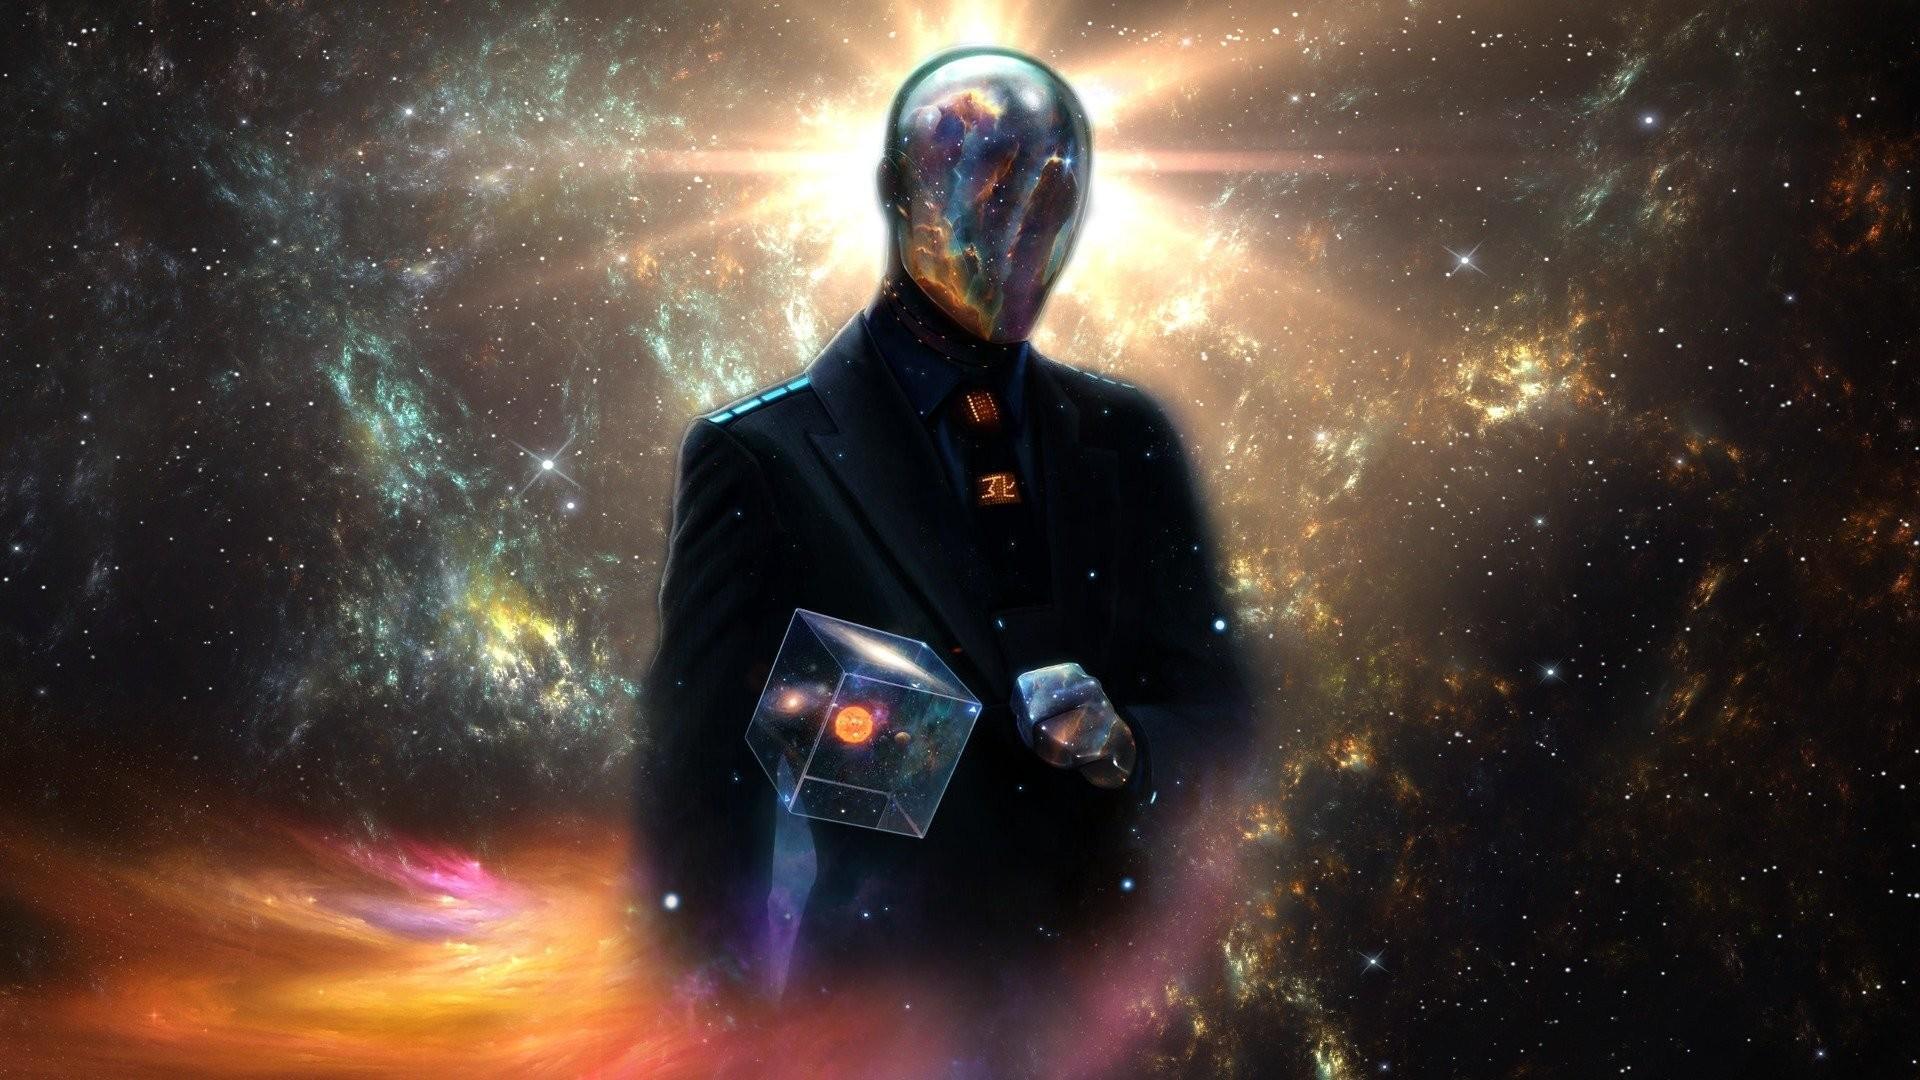 Res: 1920x1080, space universe world sun silver alien